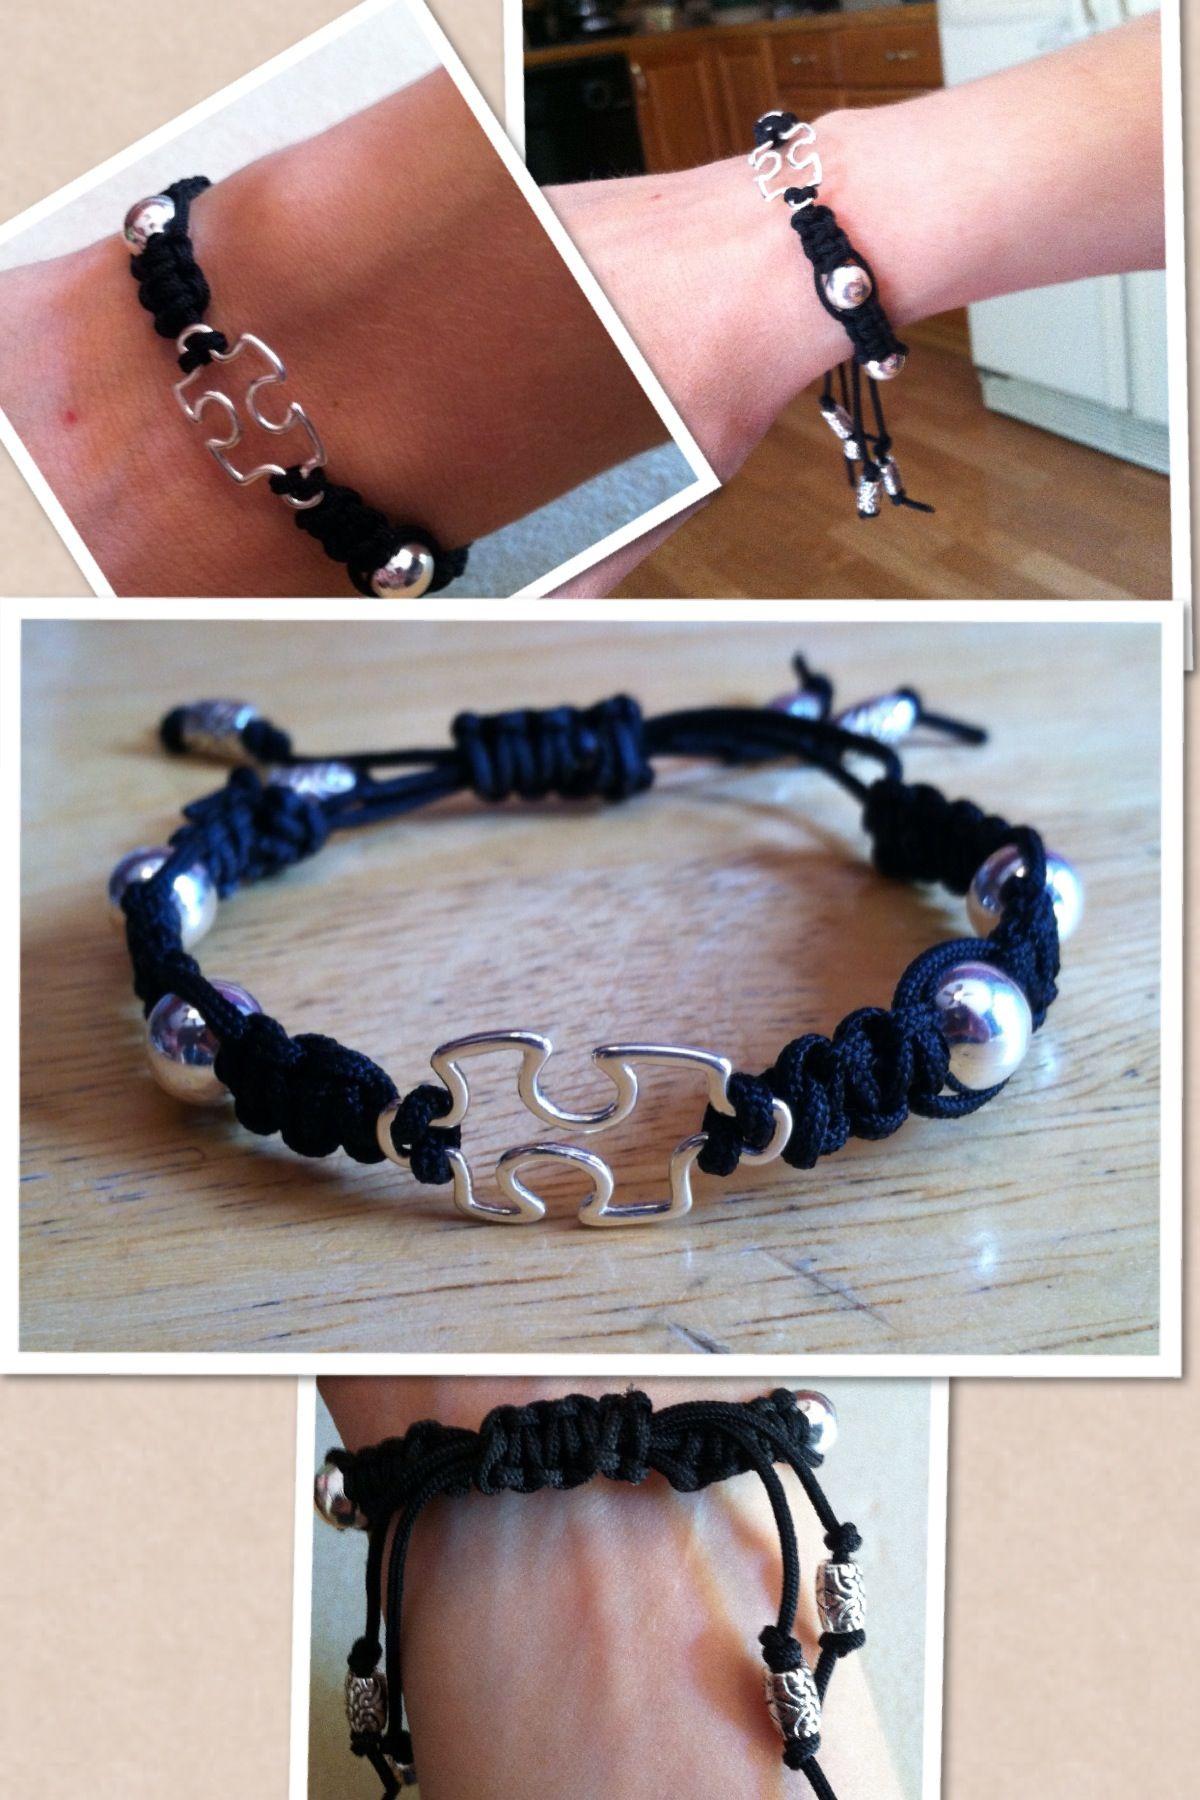 #puzzle/piece#braided#adjustable